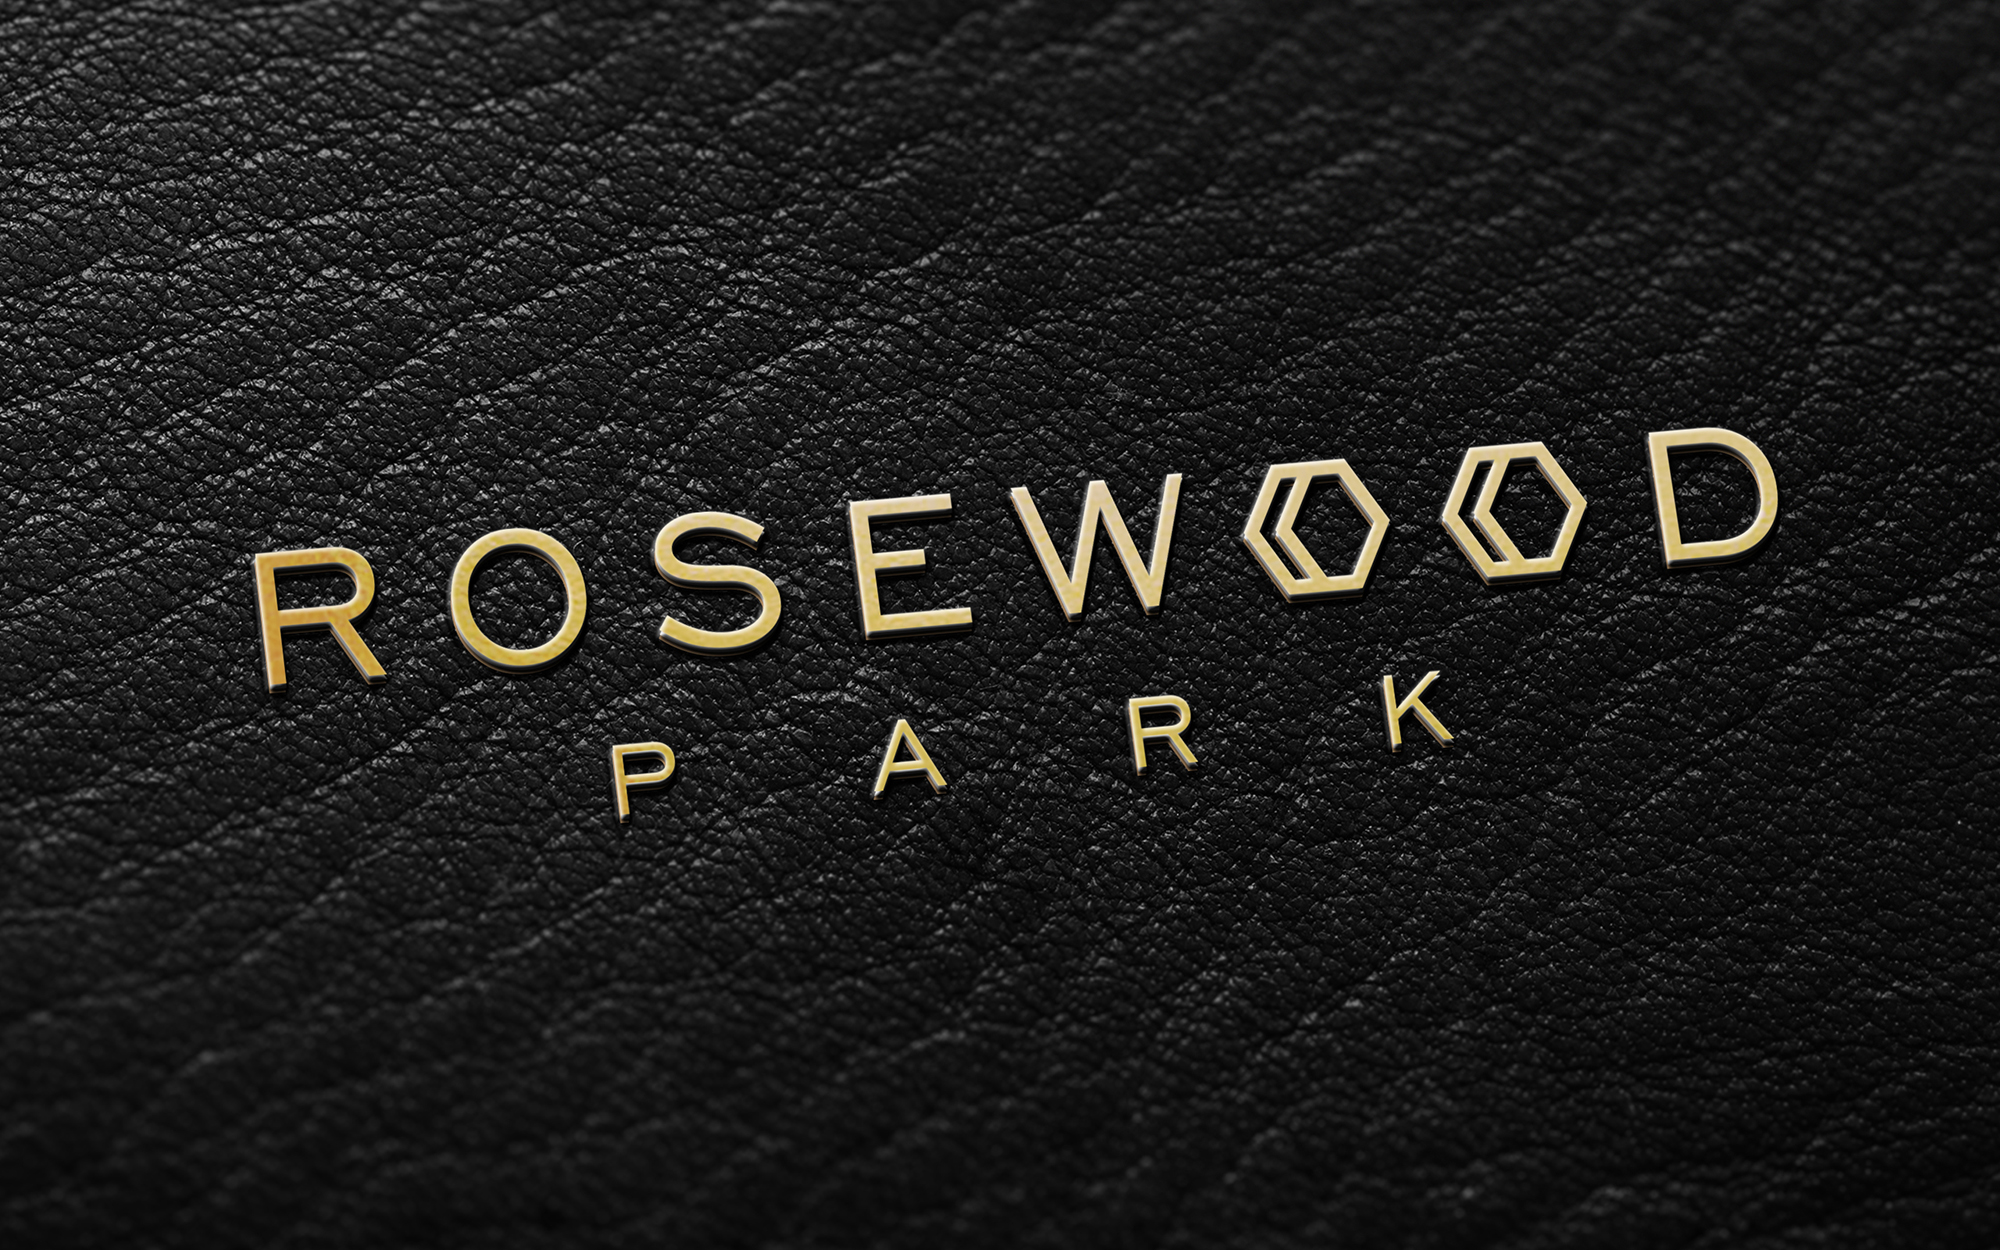 Rosewood Park